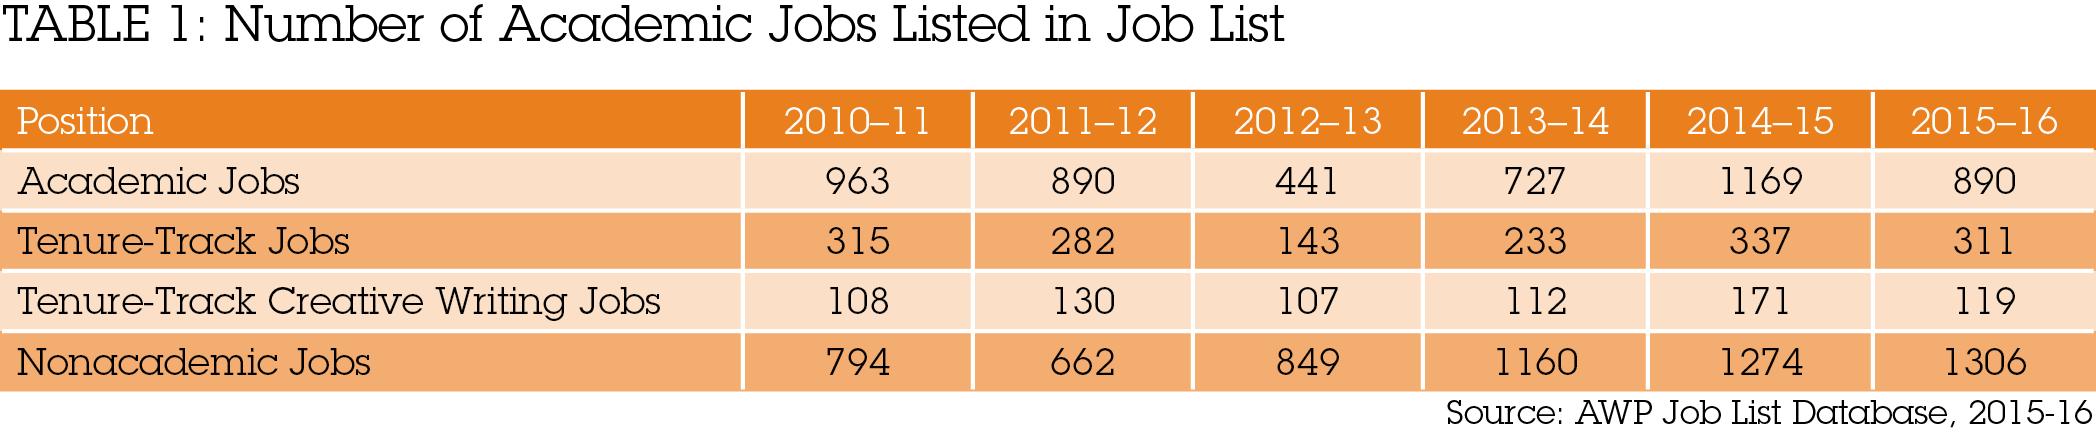 2016 Job Report Table 1